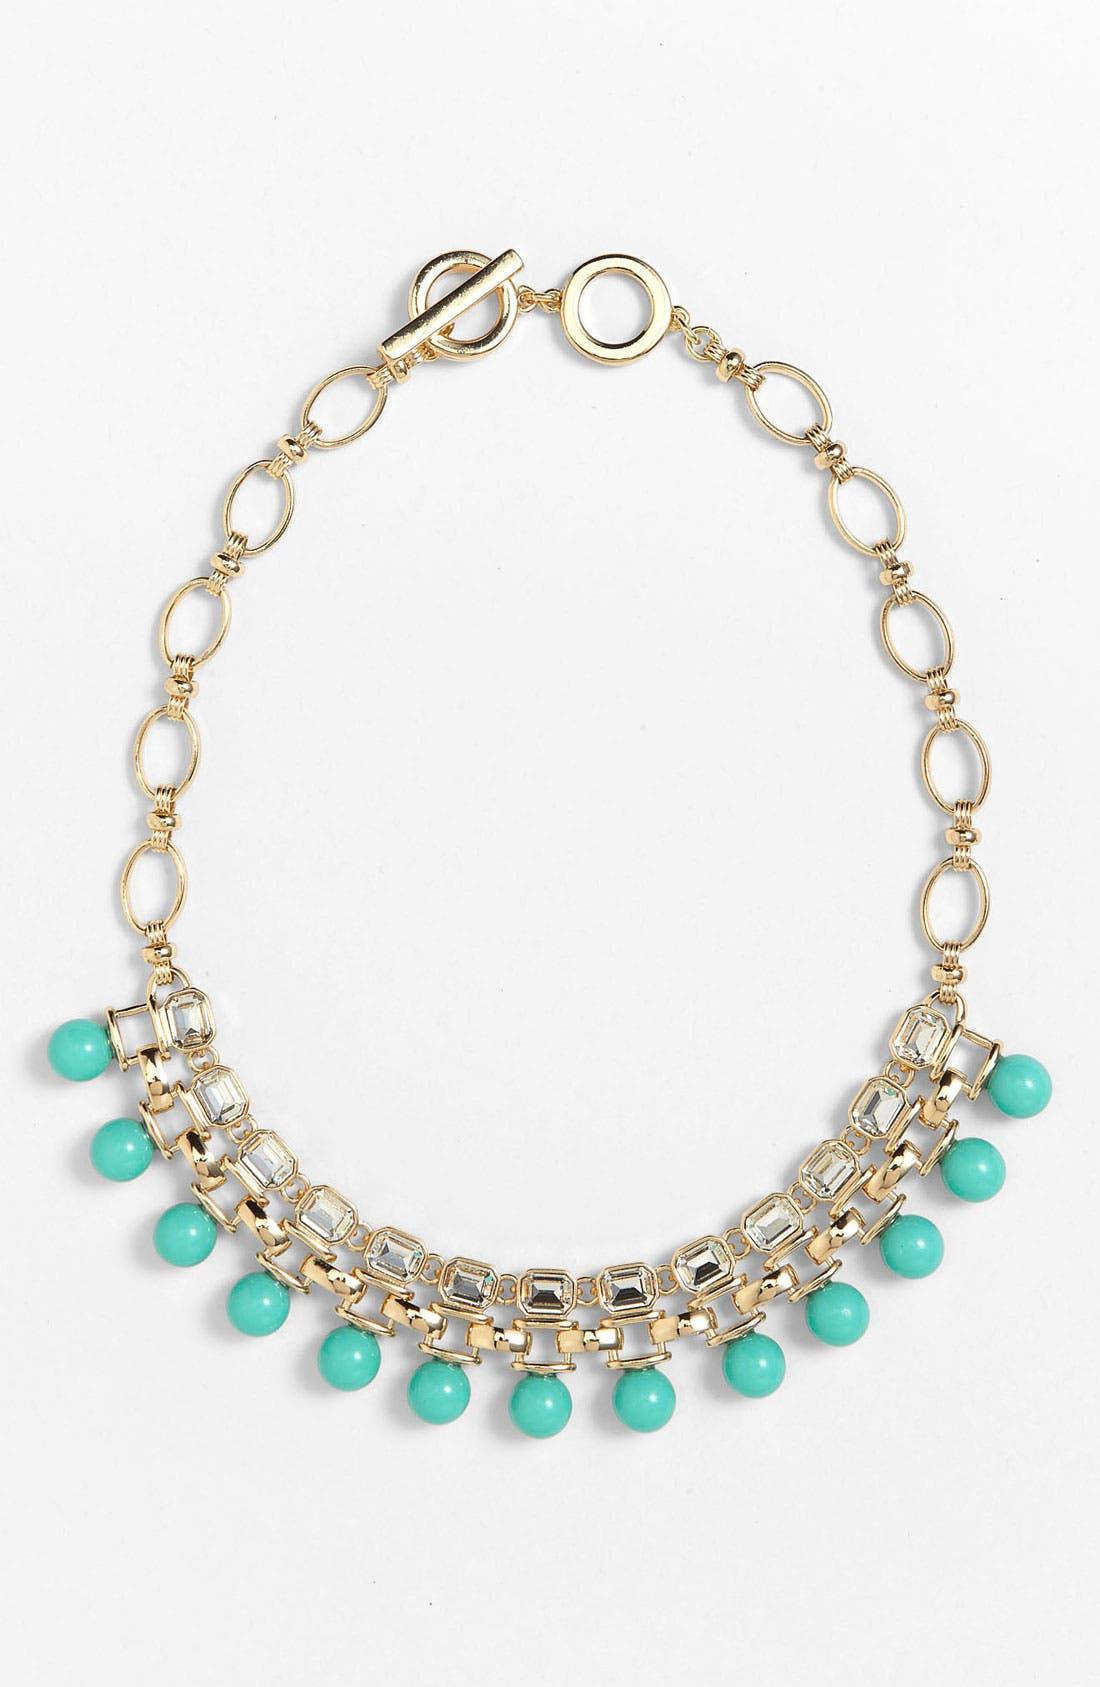 Alternate Image 1 Selected - Anne Klein 'Sorbet' Bib Necklace